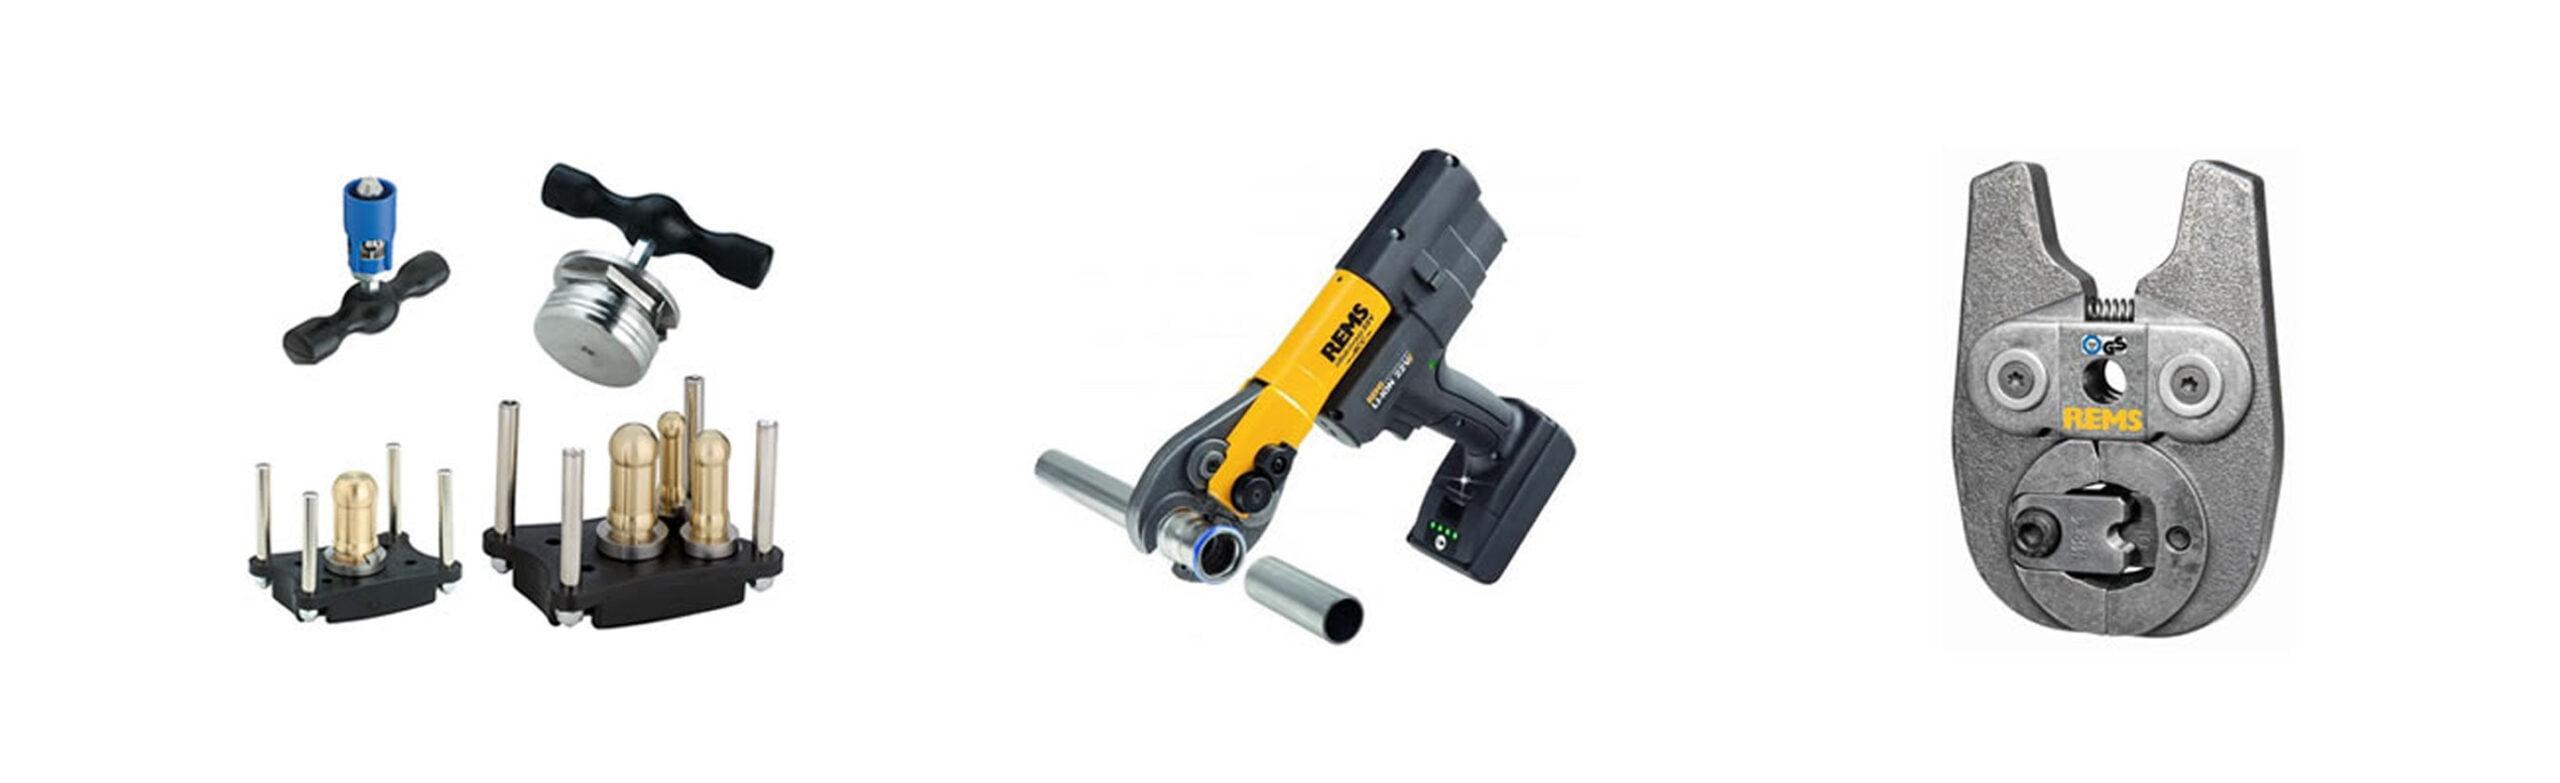 Gerpex Plumbing Tools